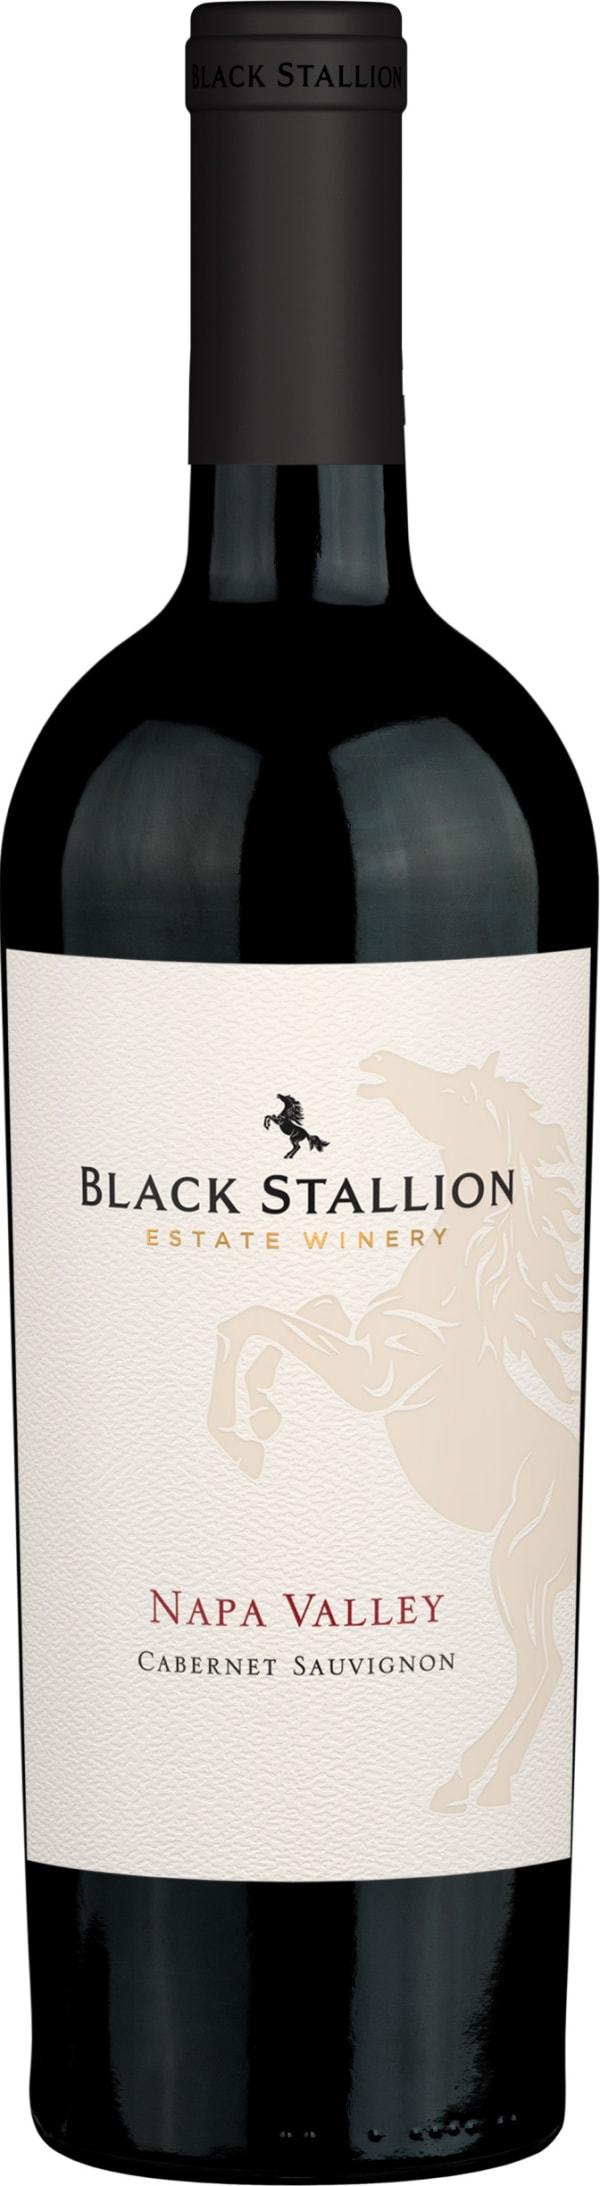 Black Stallion Cabernet Sauvignon 2013